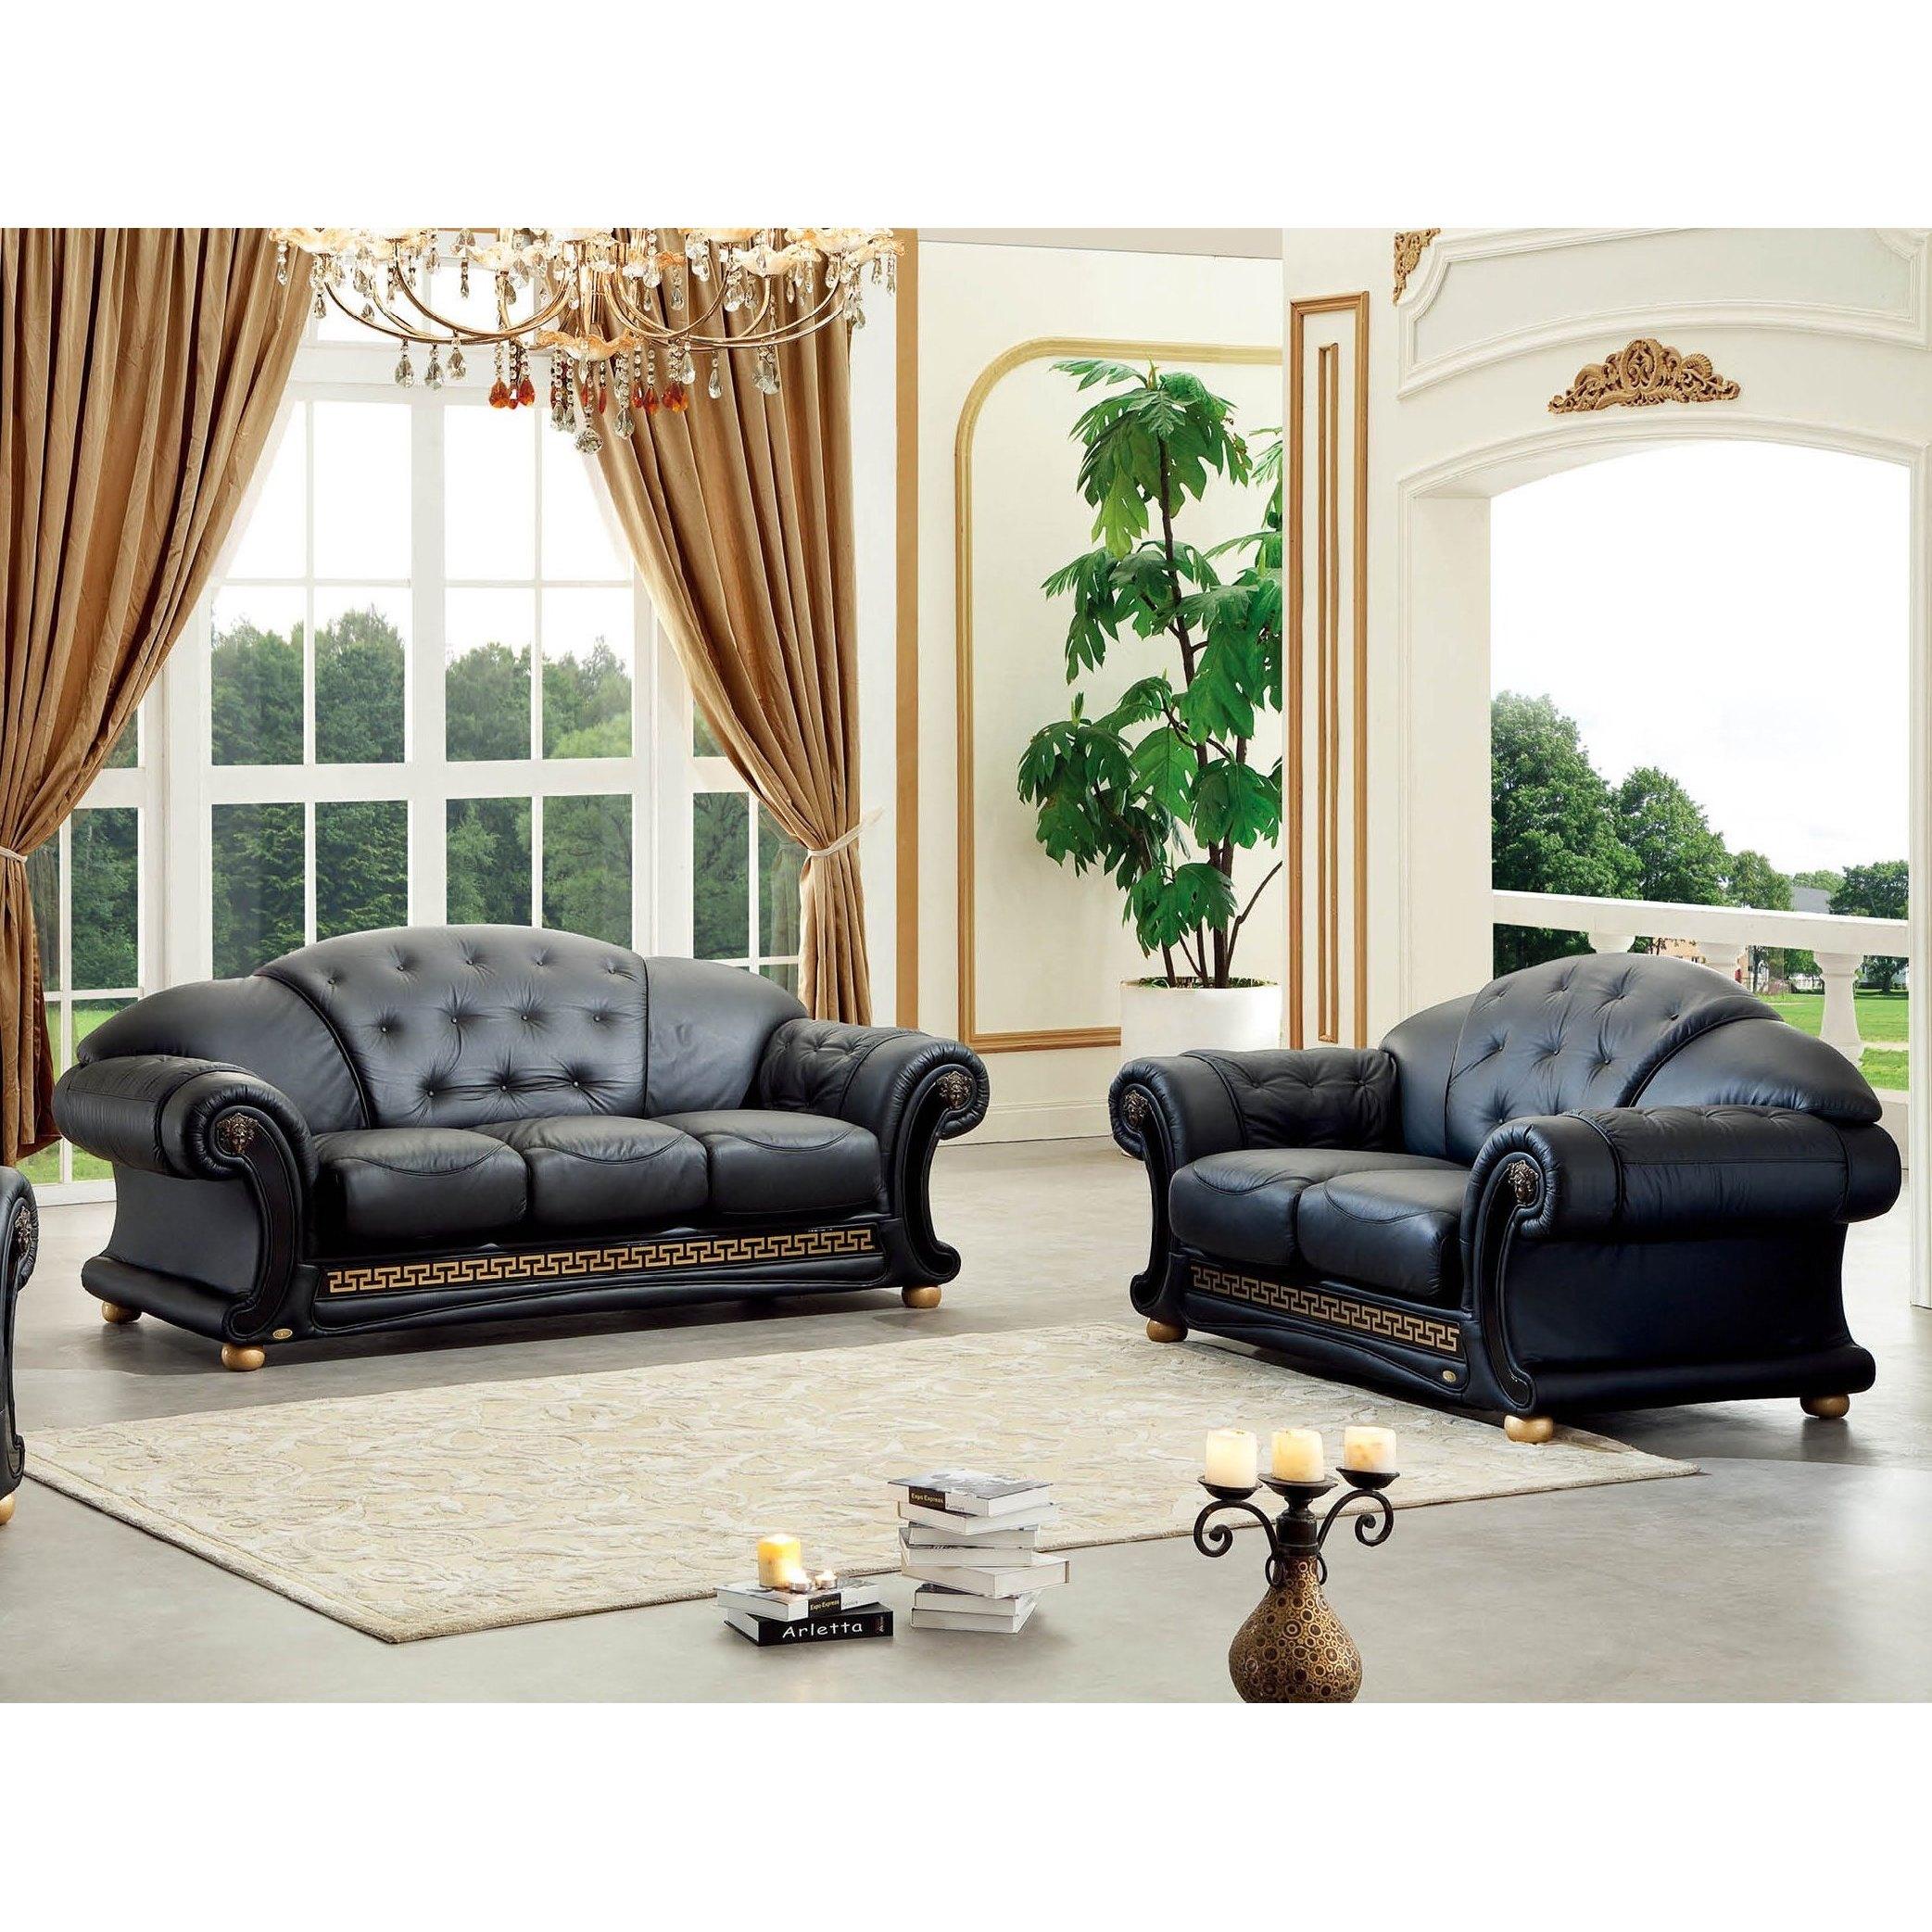 New Elegant Classic Luca Home Black Italian Bonded Leather Sofa And  Loveseat Set